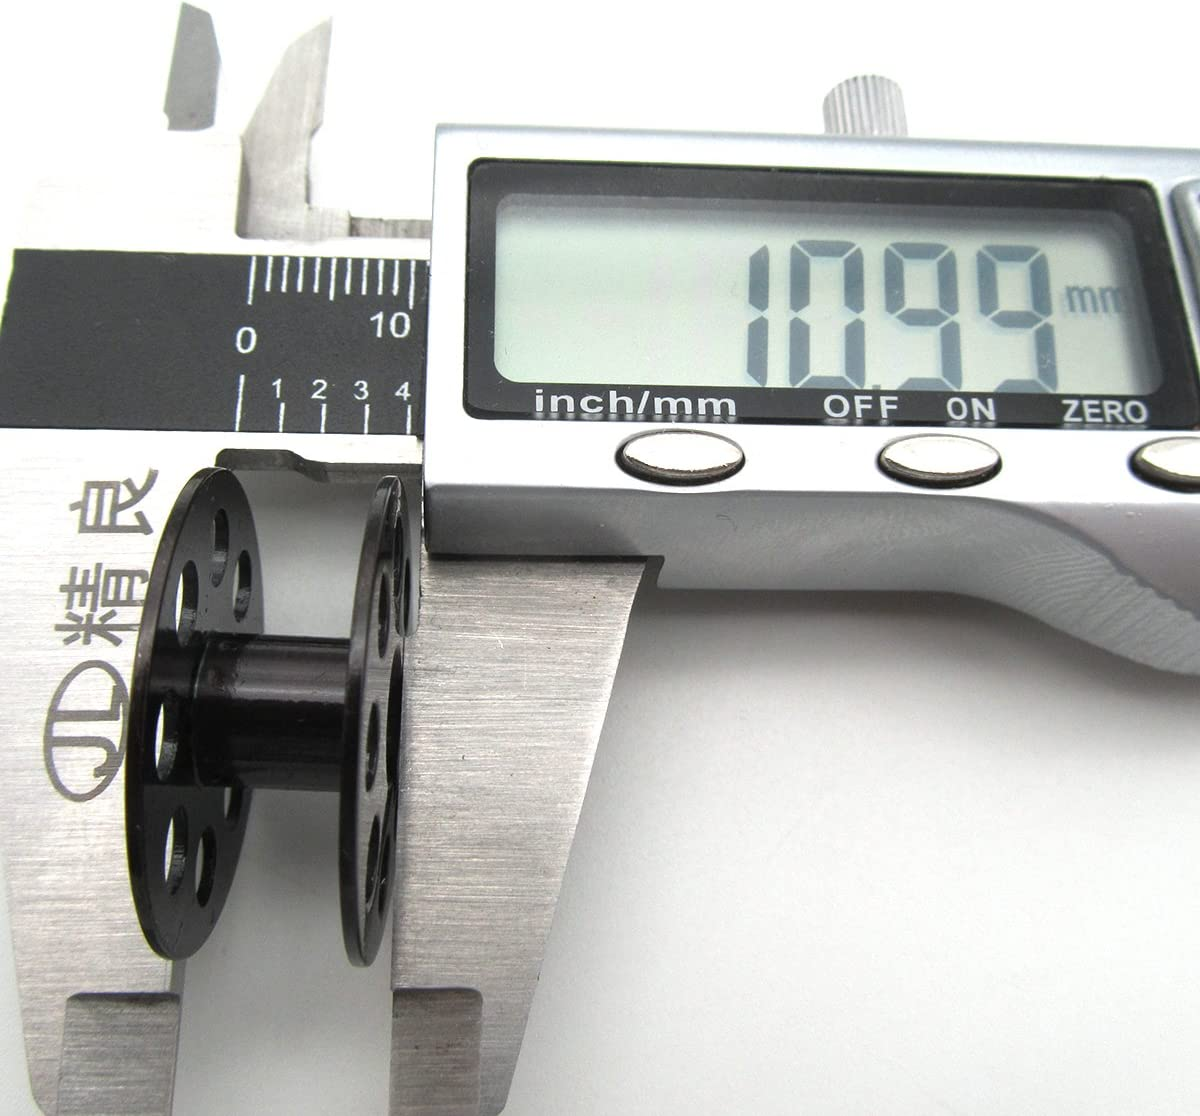 -NBL+18034 10PCS ROTARY UND//TRIM HOOK /& BOBBIN CASE /& BOBBINS for JUKI DNU-241 // NAKAJIMA 280L +BC-DBM KUNPENG #HSM-A1TR 280 2